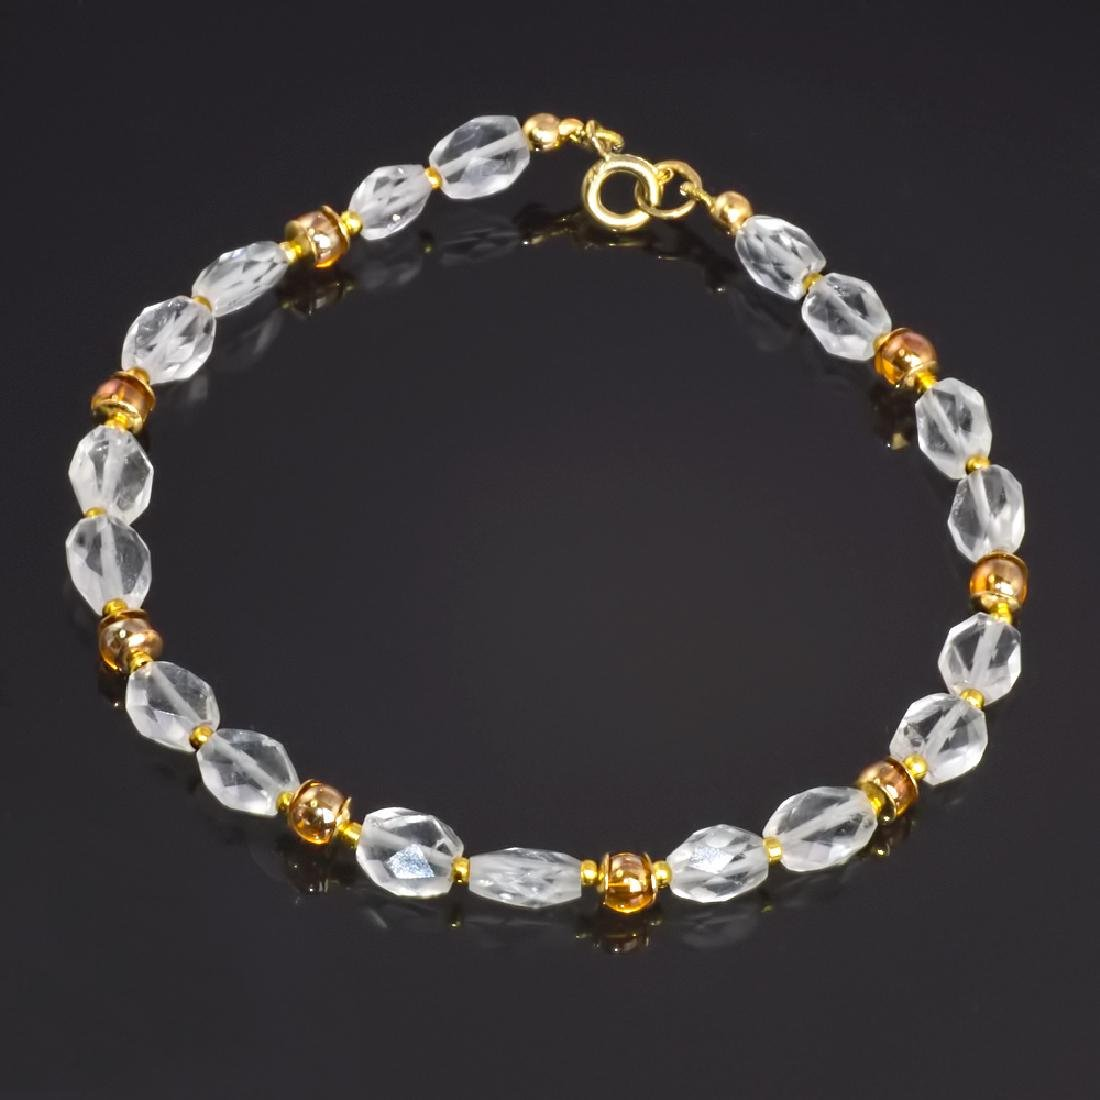 24K Suffragette Style Herkimer Diamond Quartz Bracelet